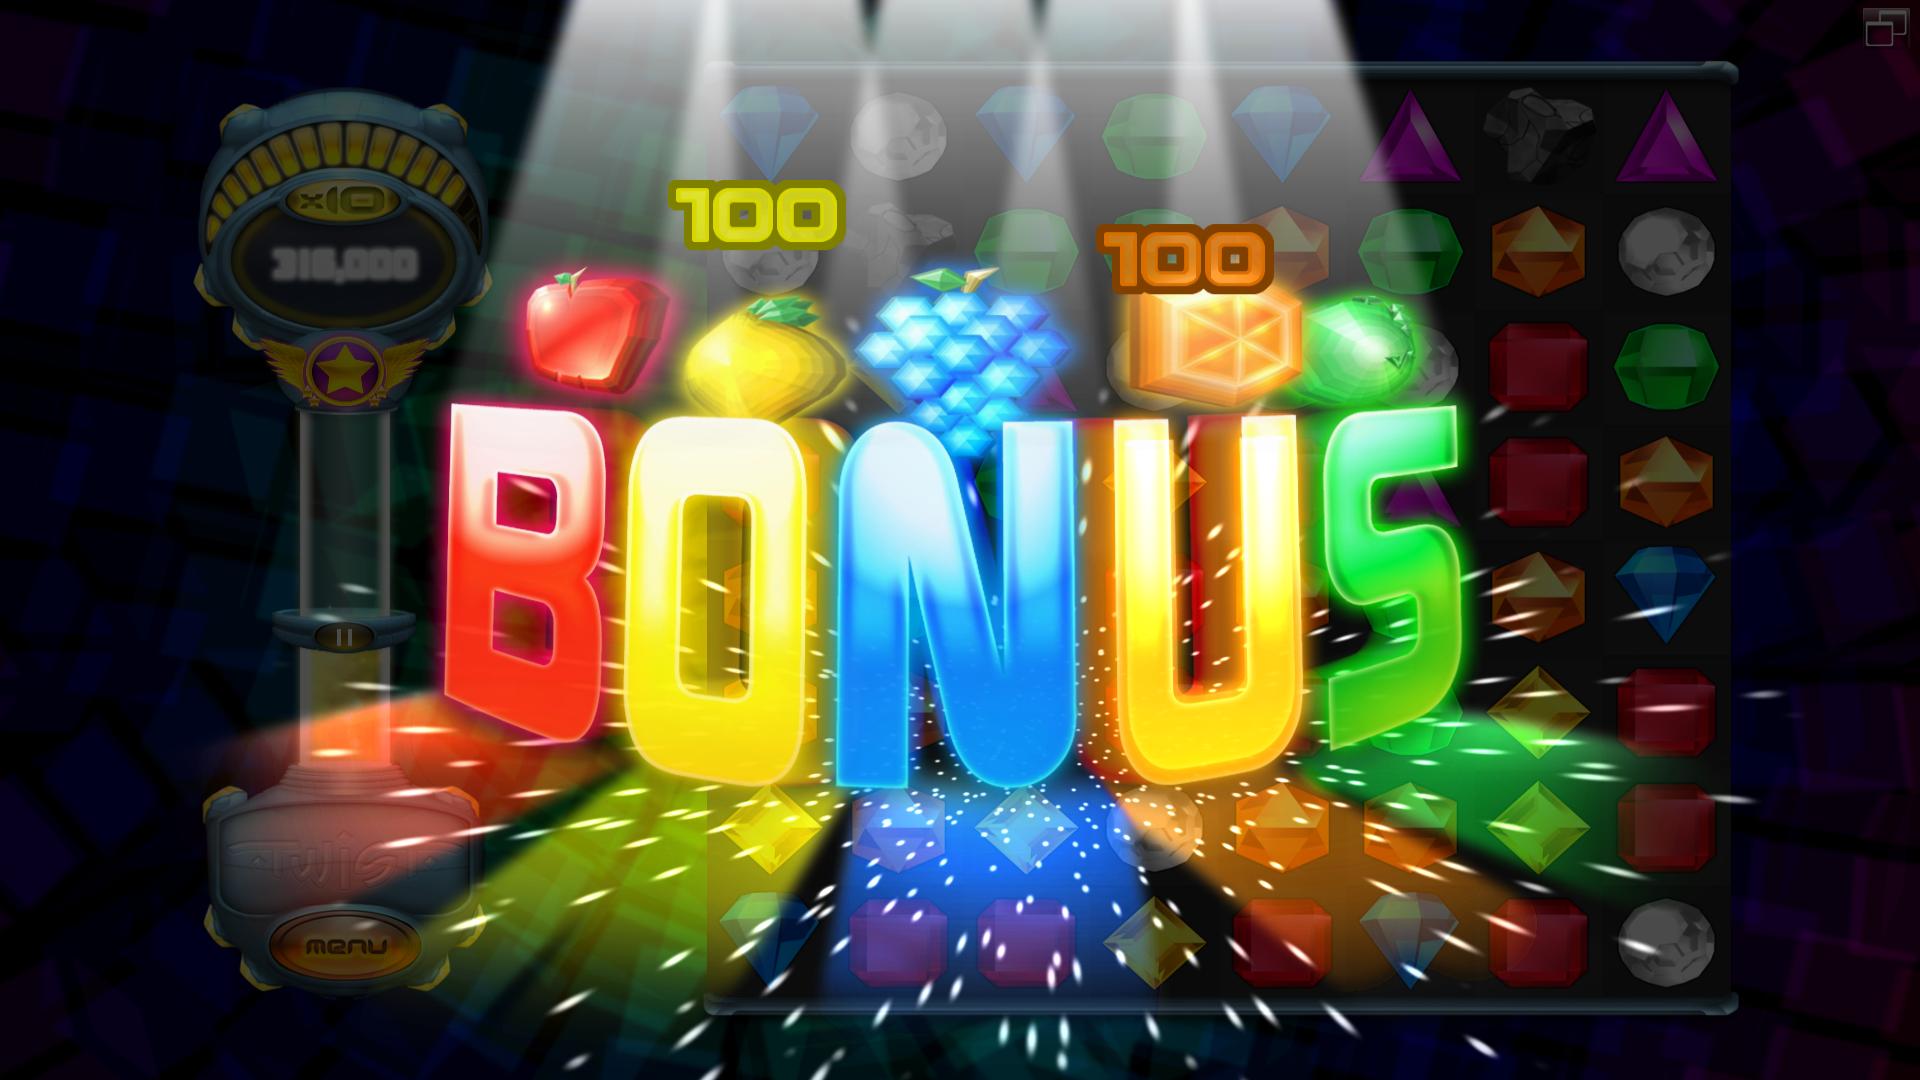 Best Casino Offers No Deposit